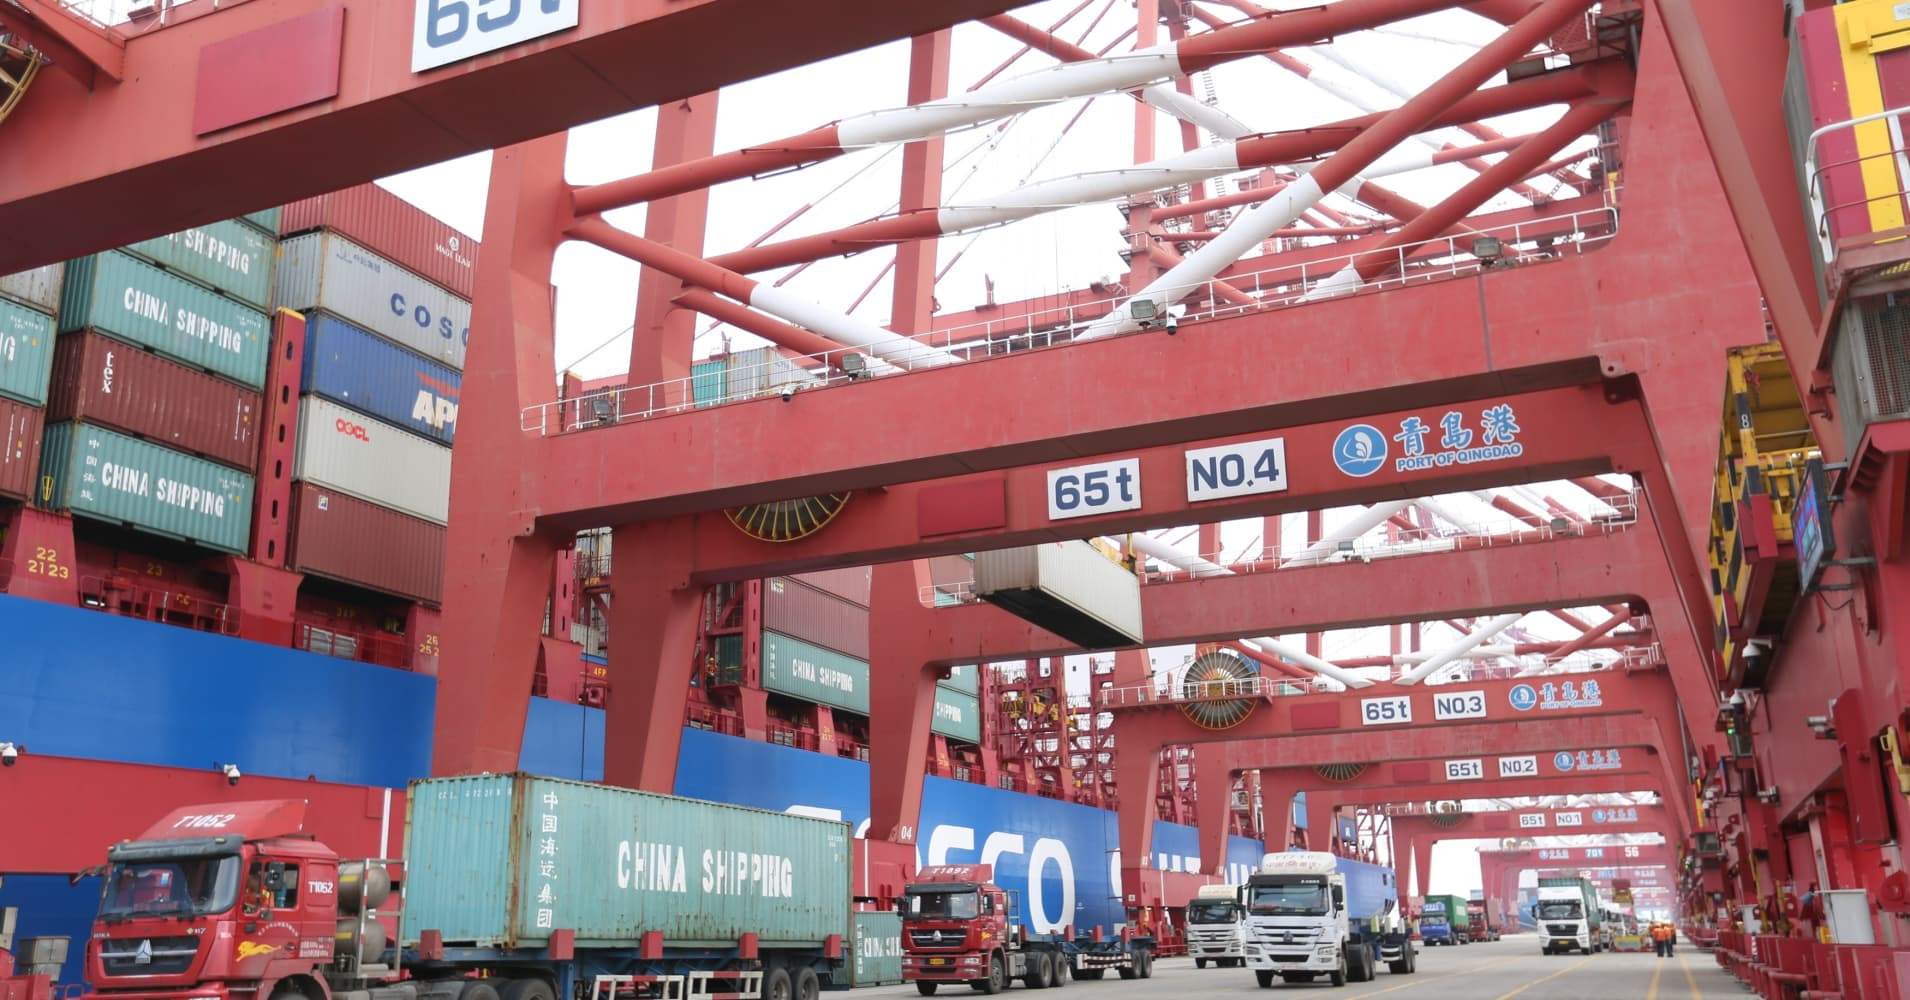 European stocks open lower after China's export slump rattles markets